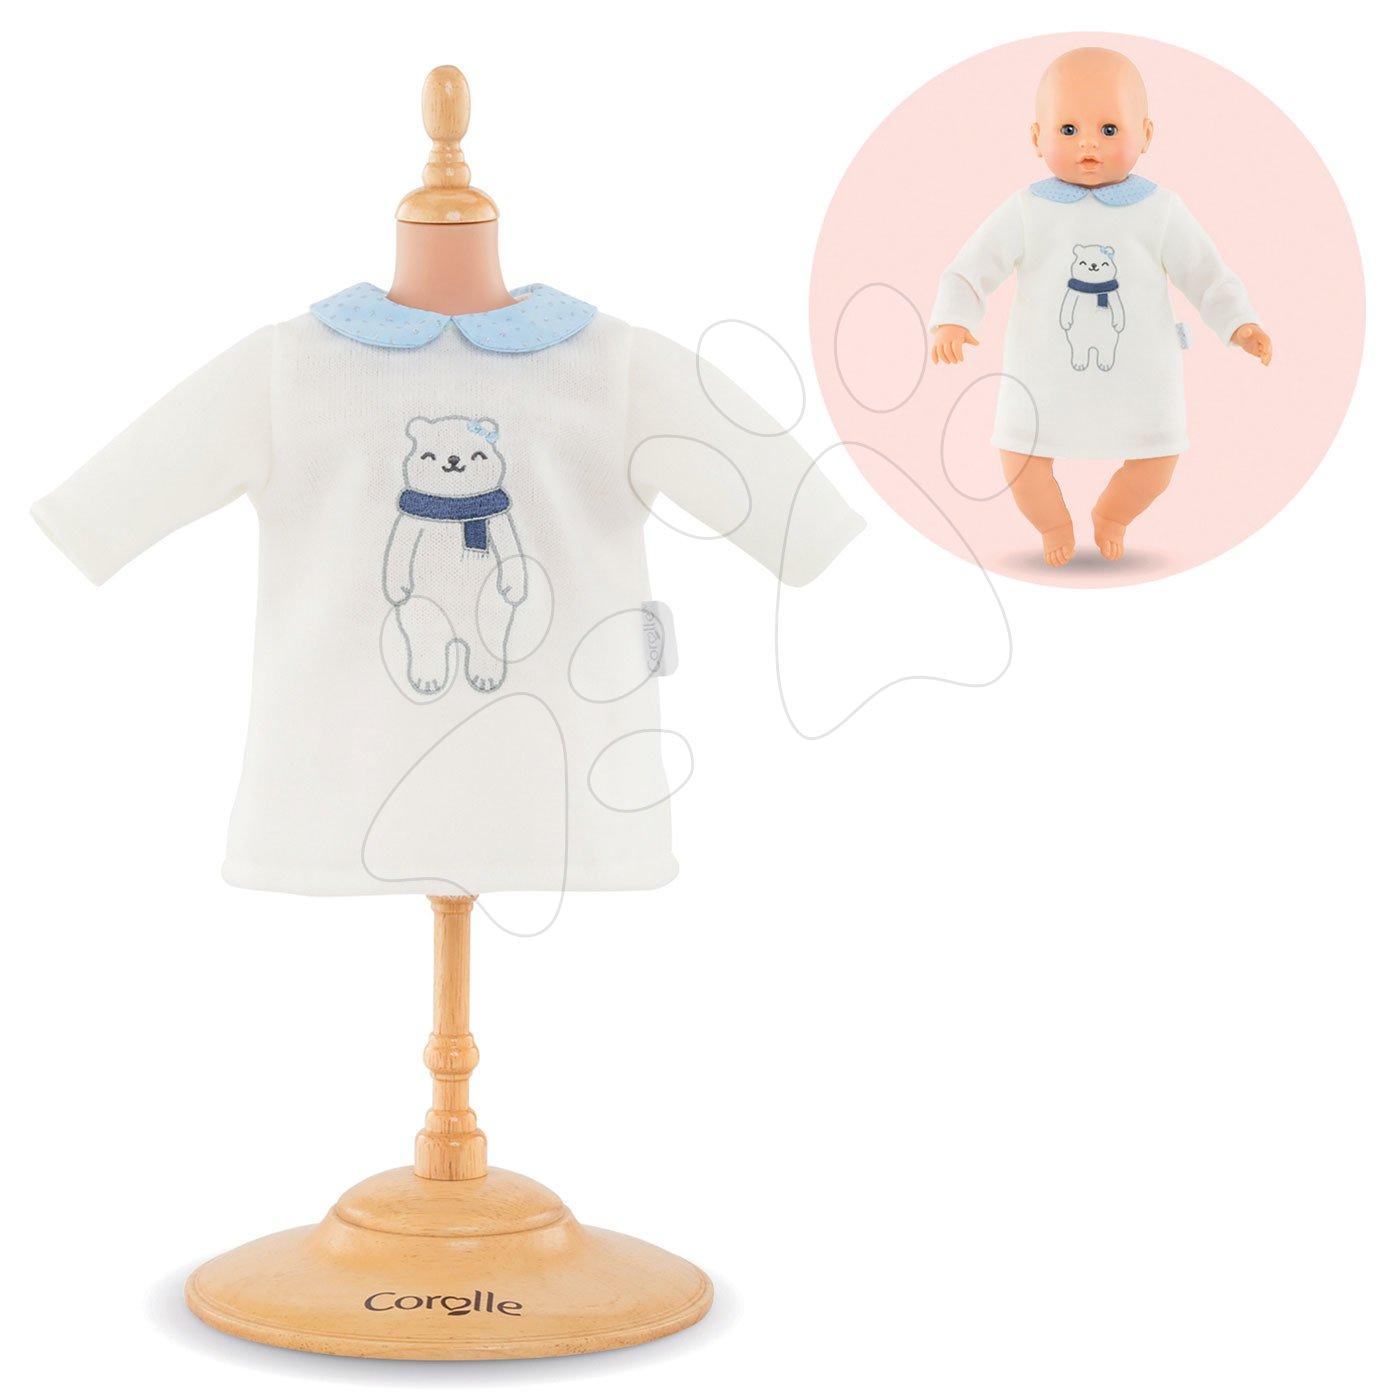 Oblečenie Dress Winter Sparkle Mon Grand Poupon Corolle pre 42 cm bábiku od 24 mes